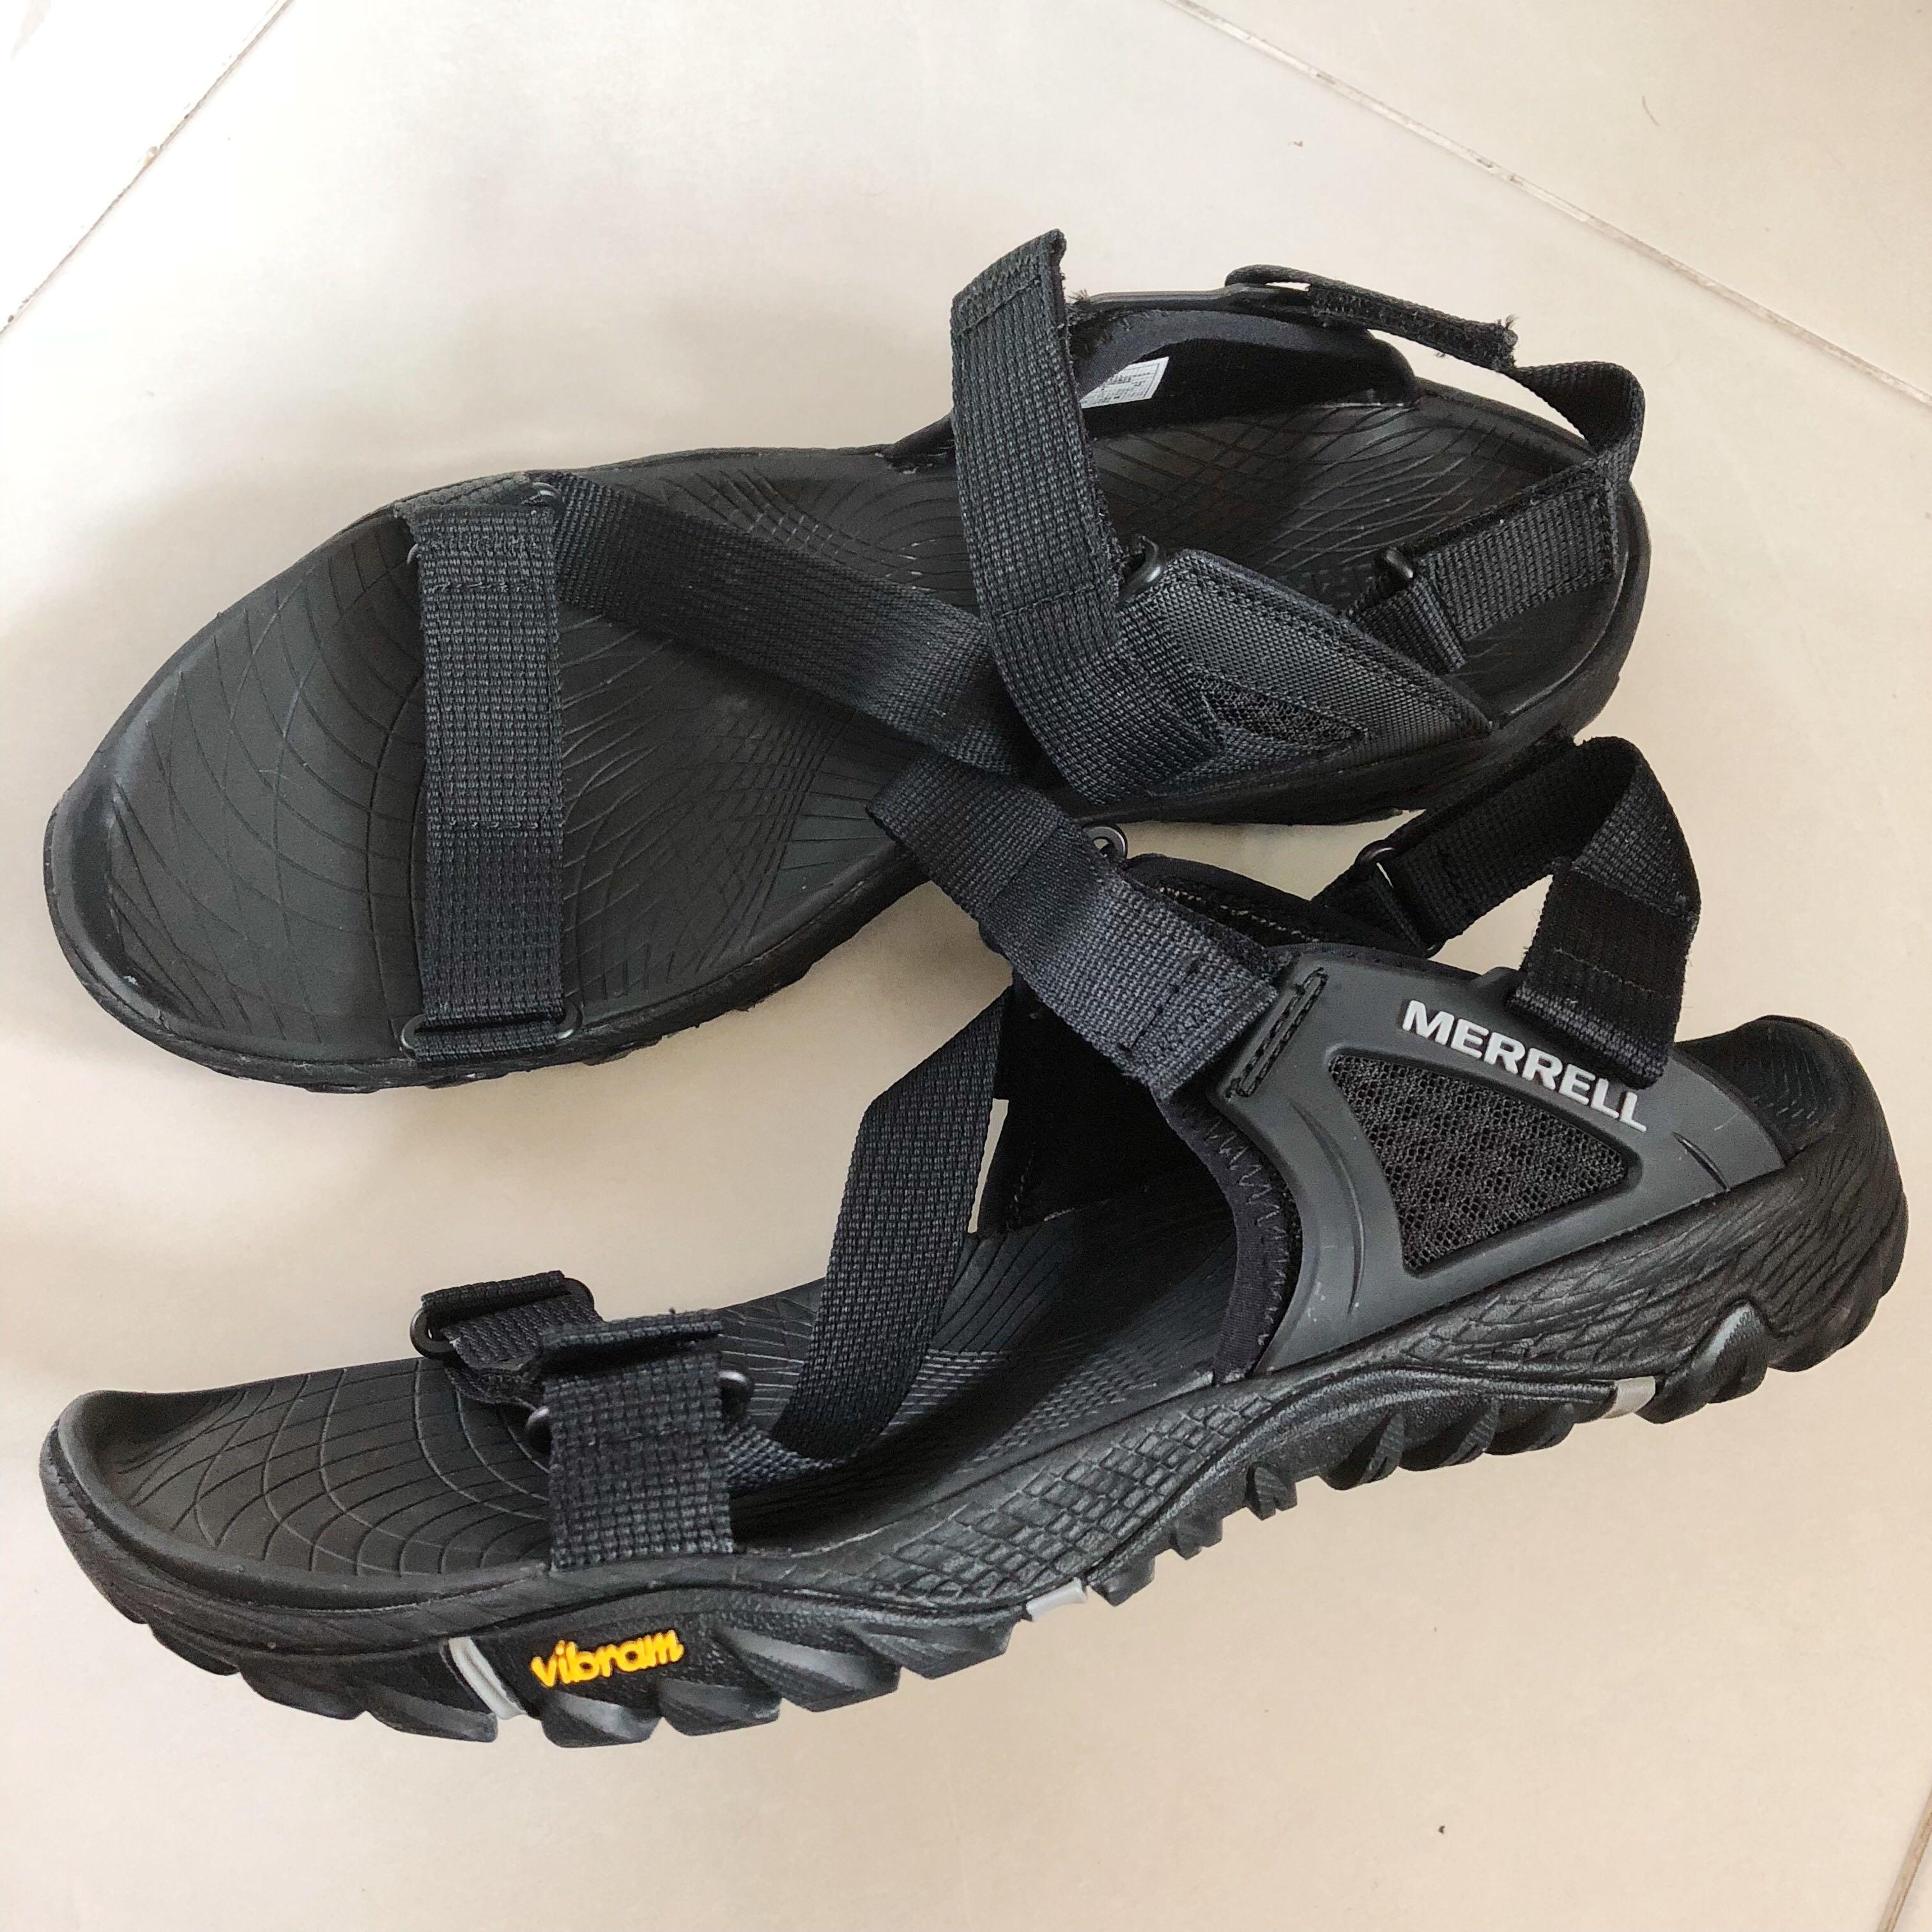 1d5b69d0583344 Us9 Blaze Sandals Black Uk8 MintMen's Mens Merrell All Web Out oCxWBerd